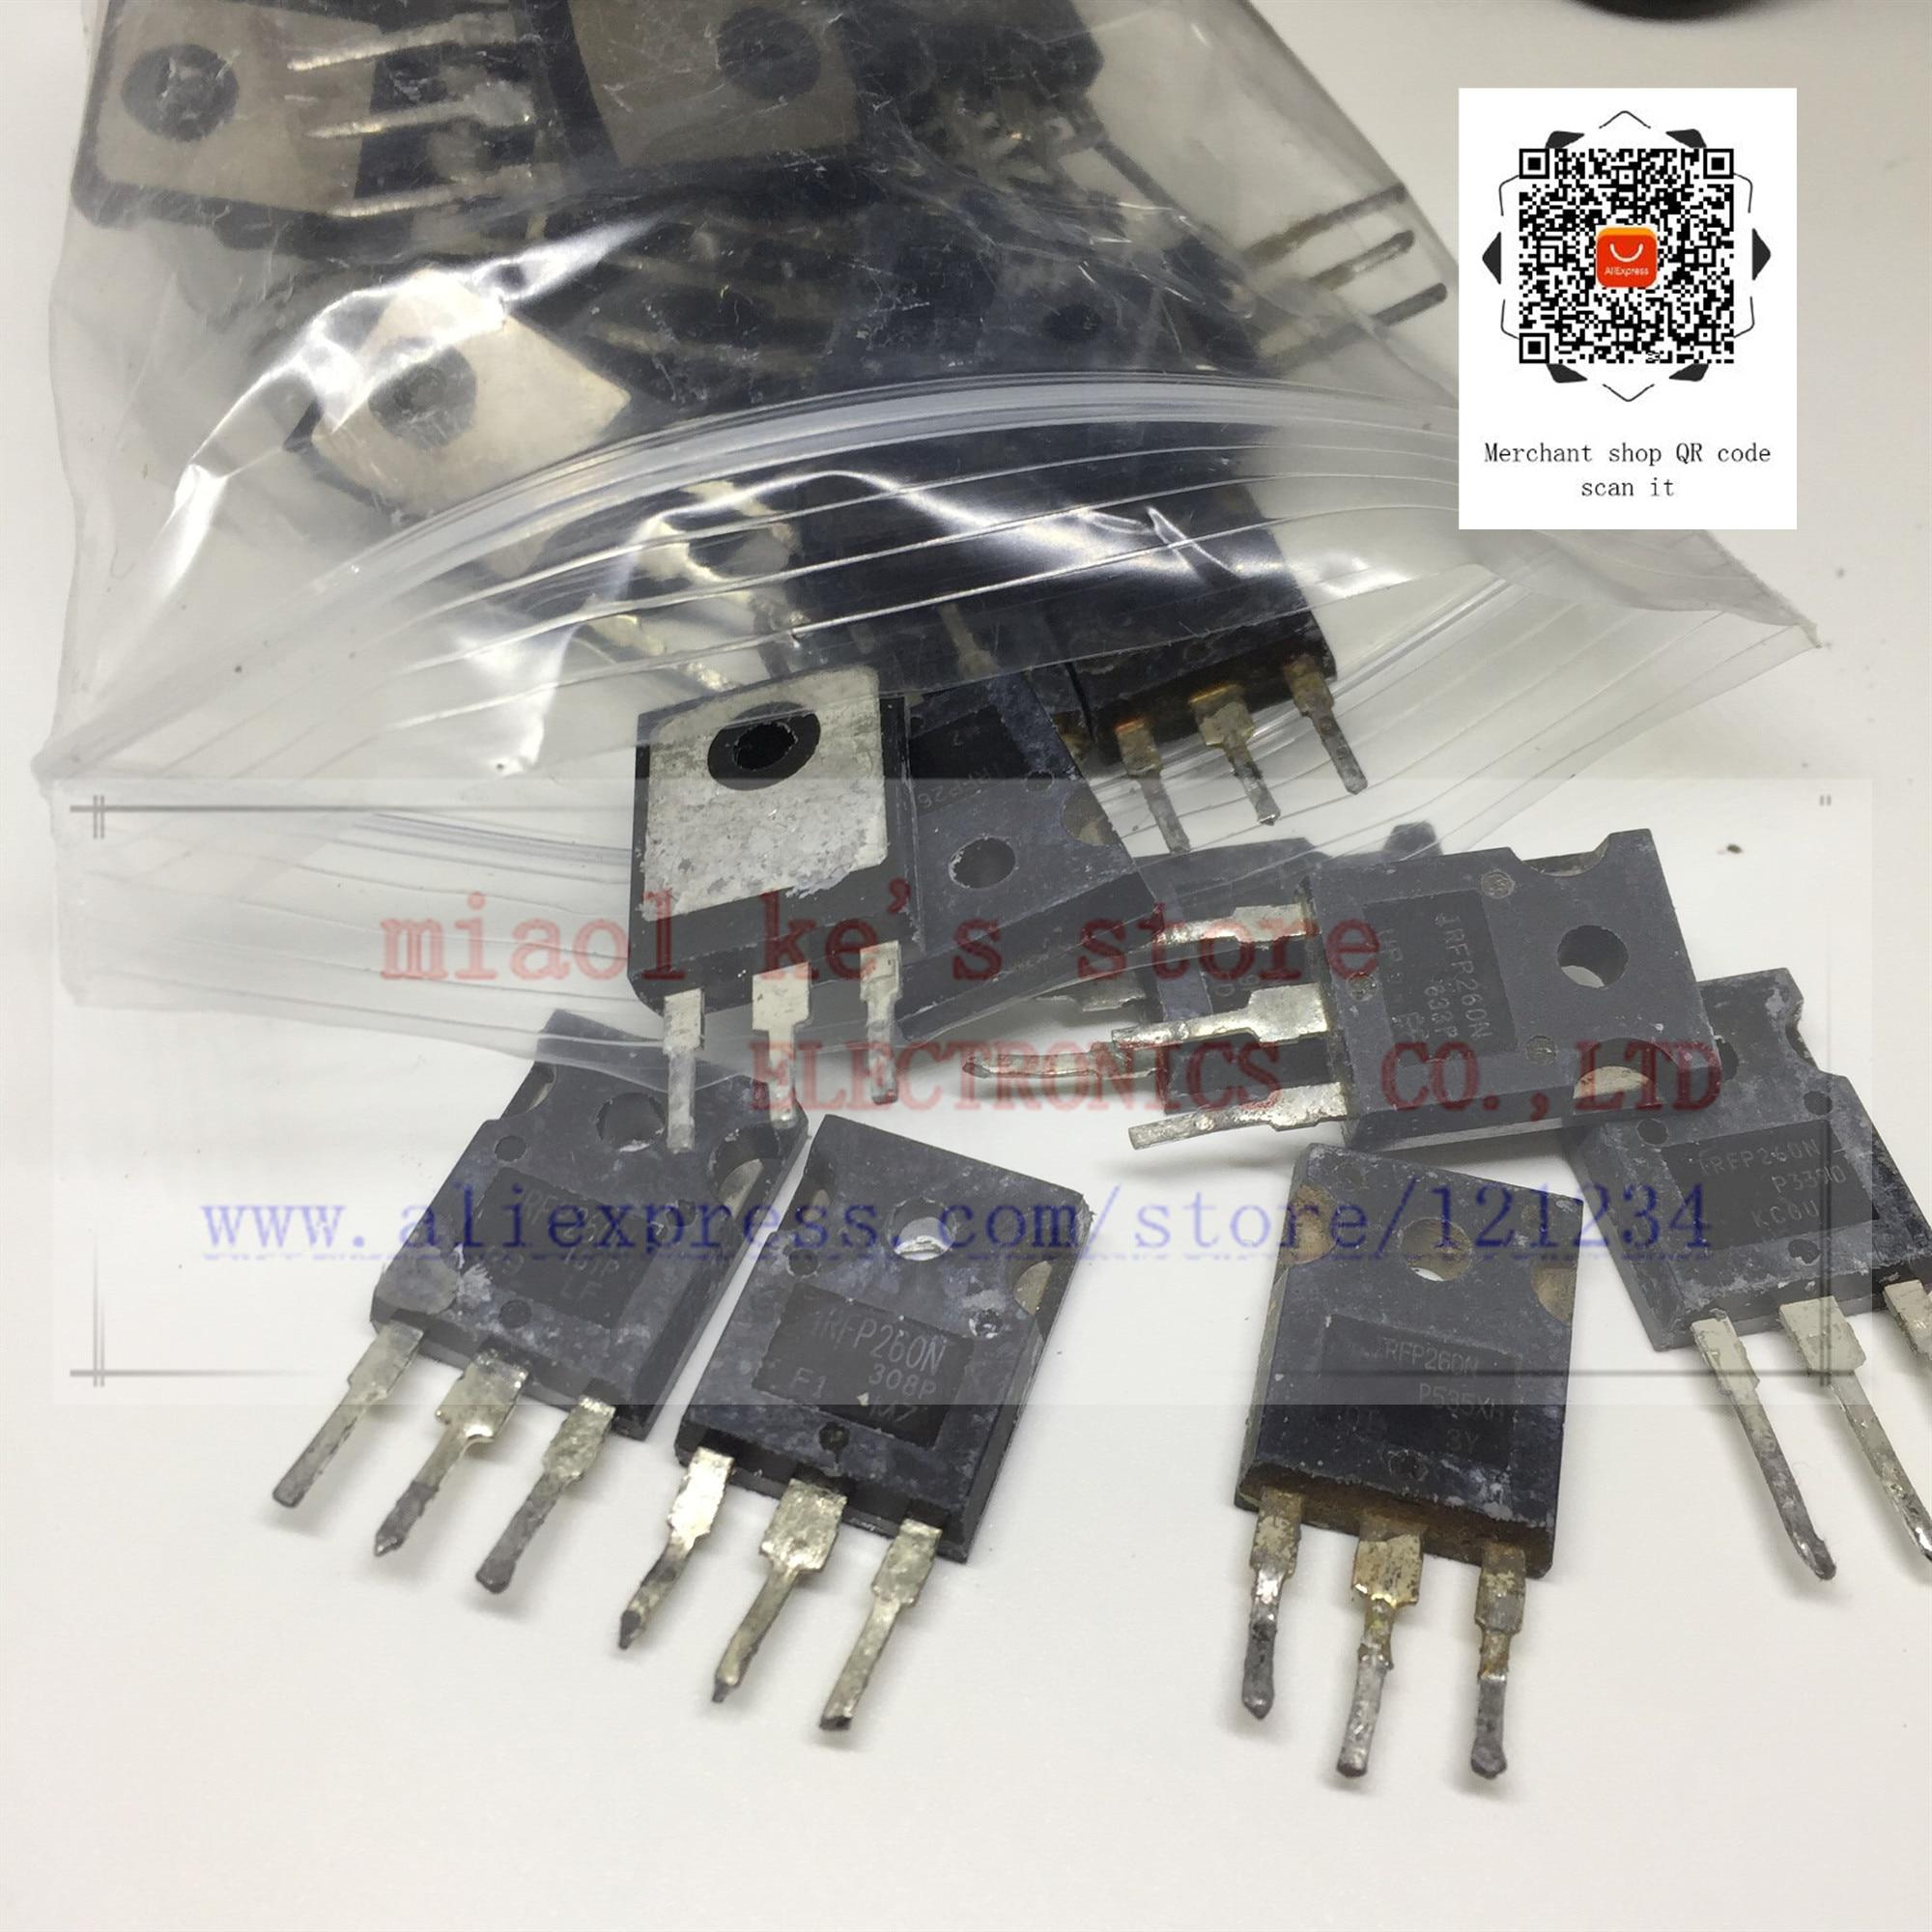 [ 50pcs/1lot ] IRFP260 IRFP260N IRFP260NPBF [ Used goods ]- Through hole MOSFET N-CH pval (2068) 200V 50A 300W TO-247AC